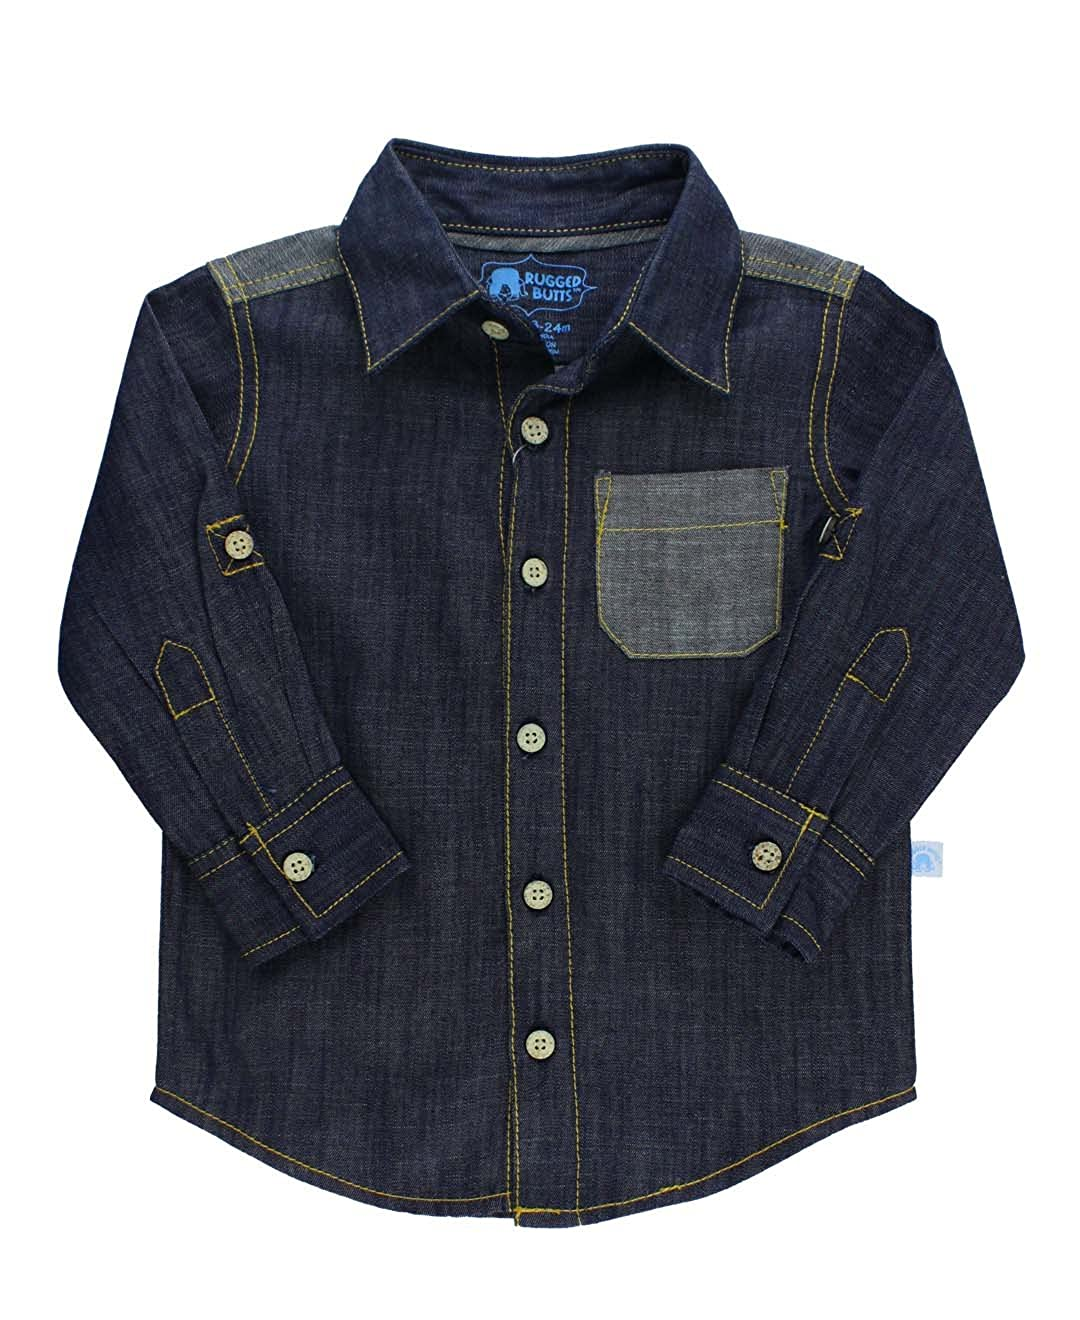 RuggedButts Little Boys Denim Long Sleeve Button Down Shirt with Button Tabs BLWYYXX-DNIM-SC-TDLR